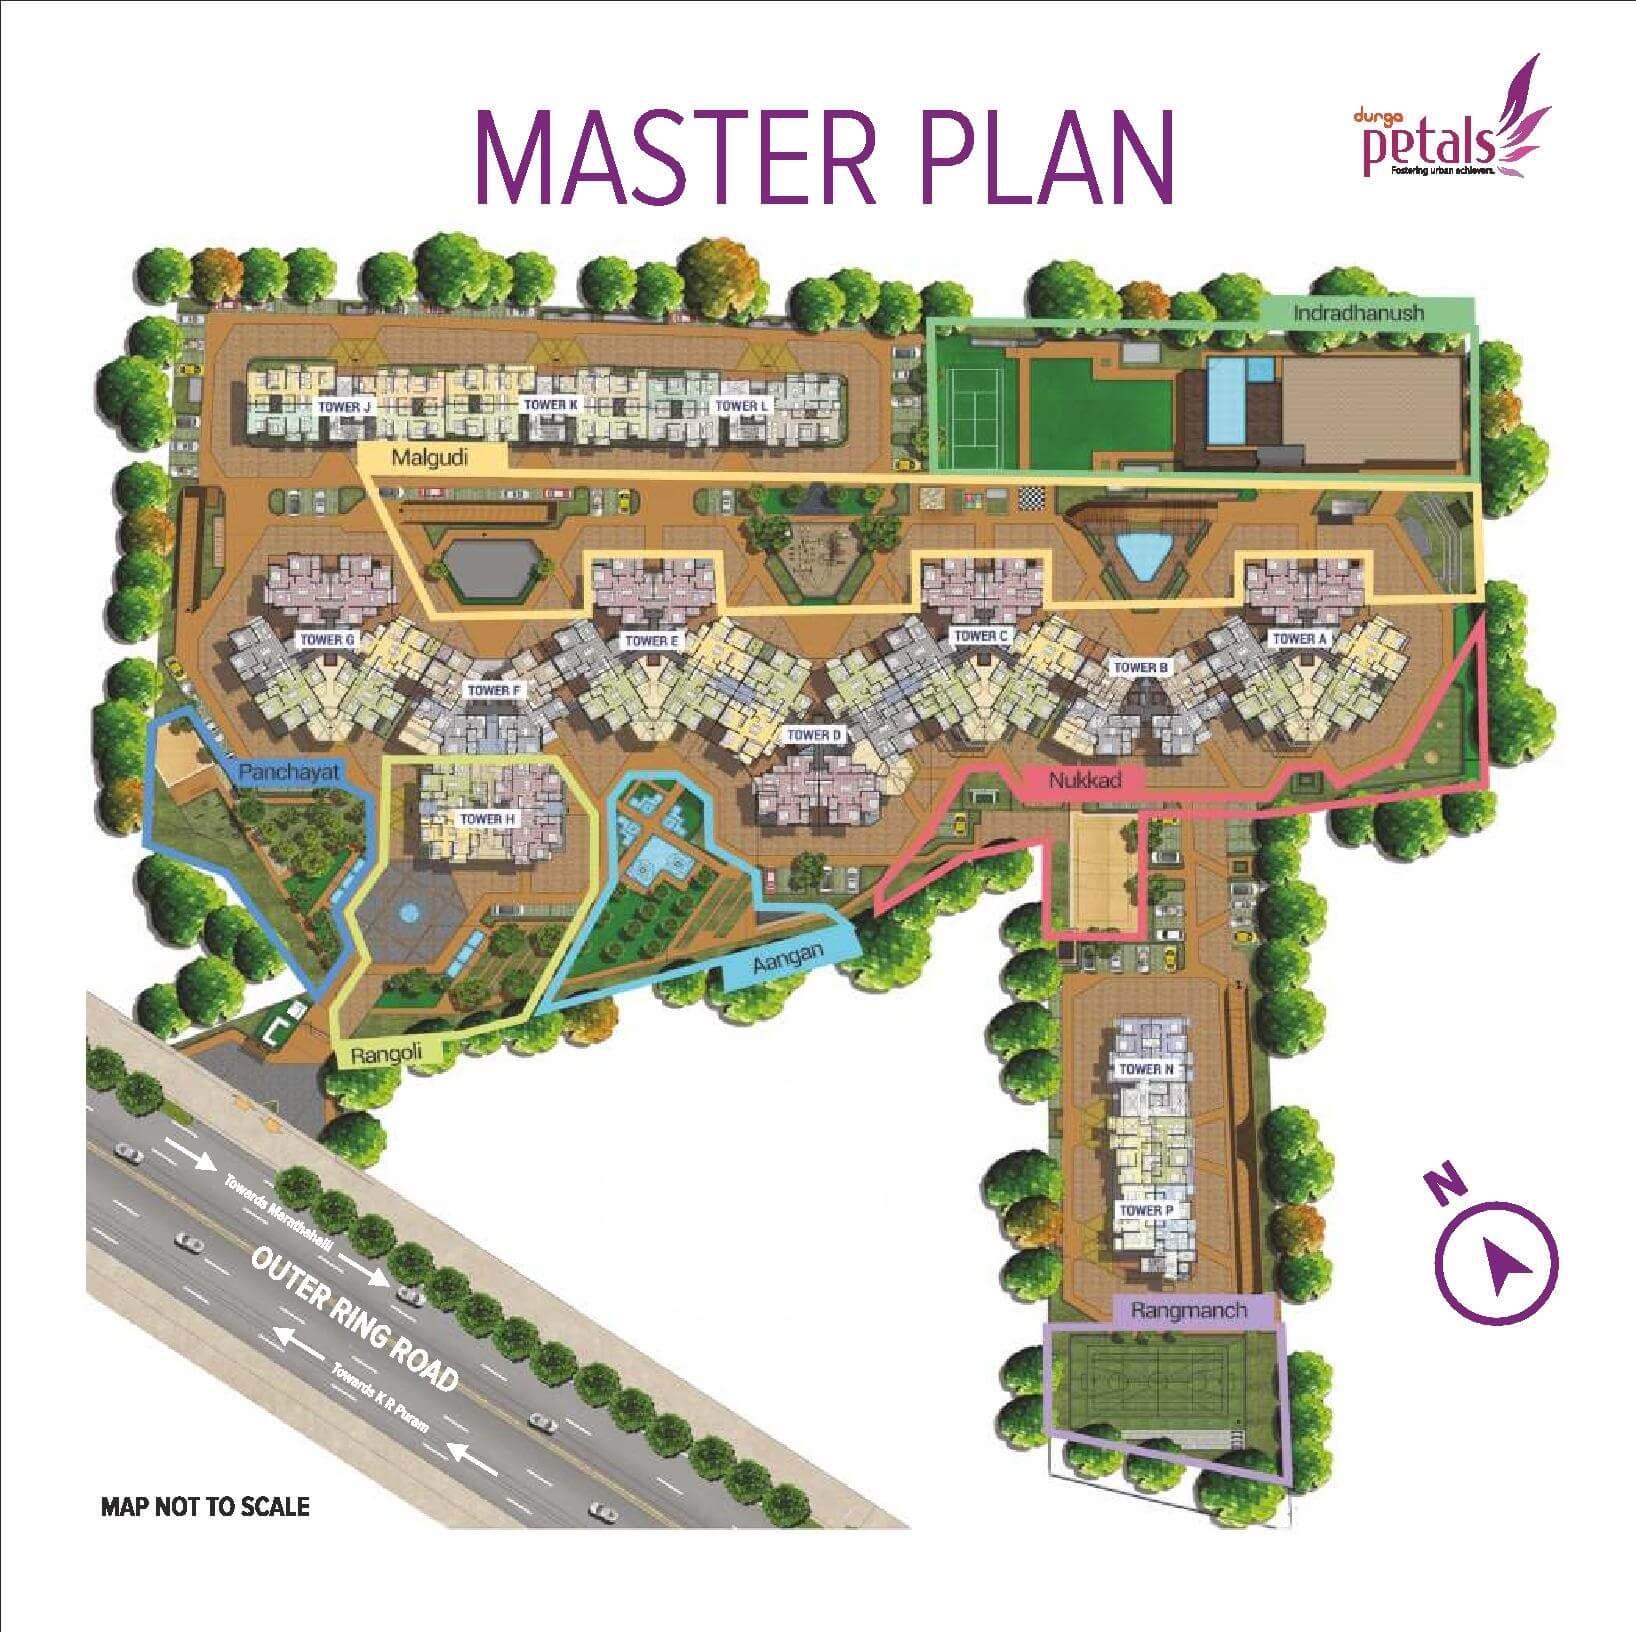 Durga_Petals_masterplan